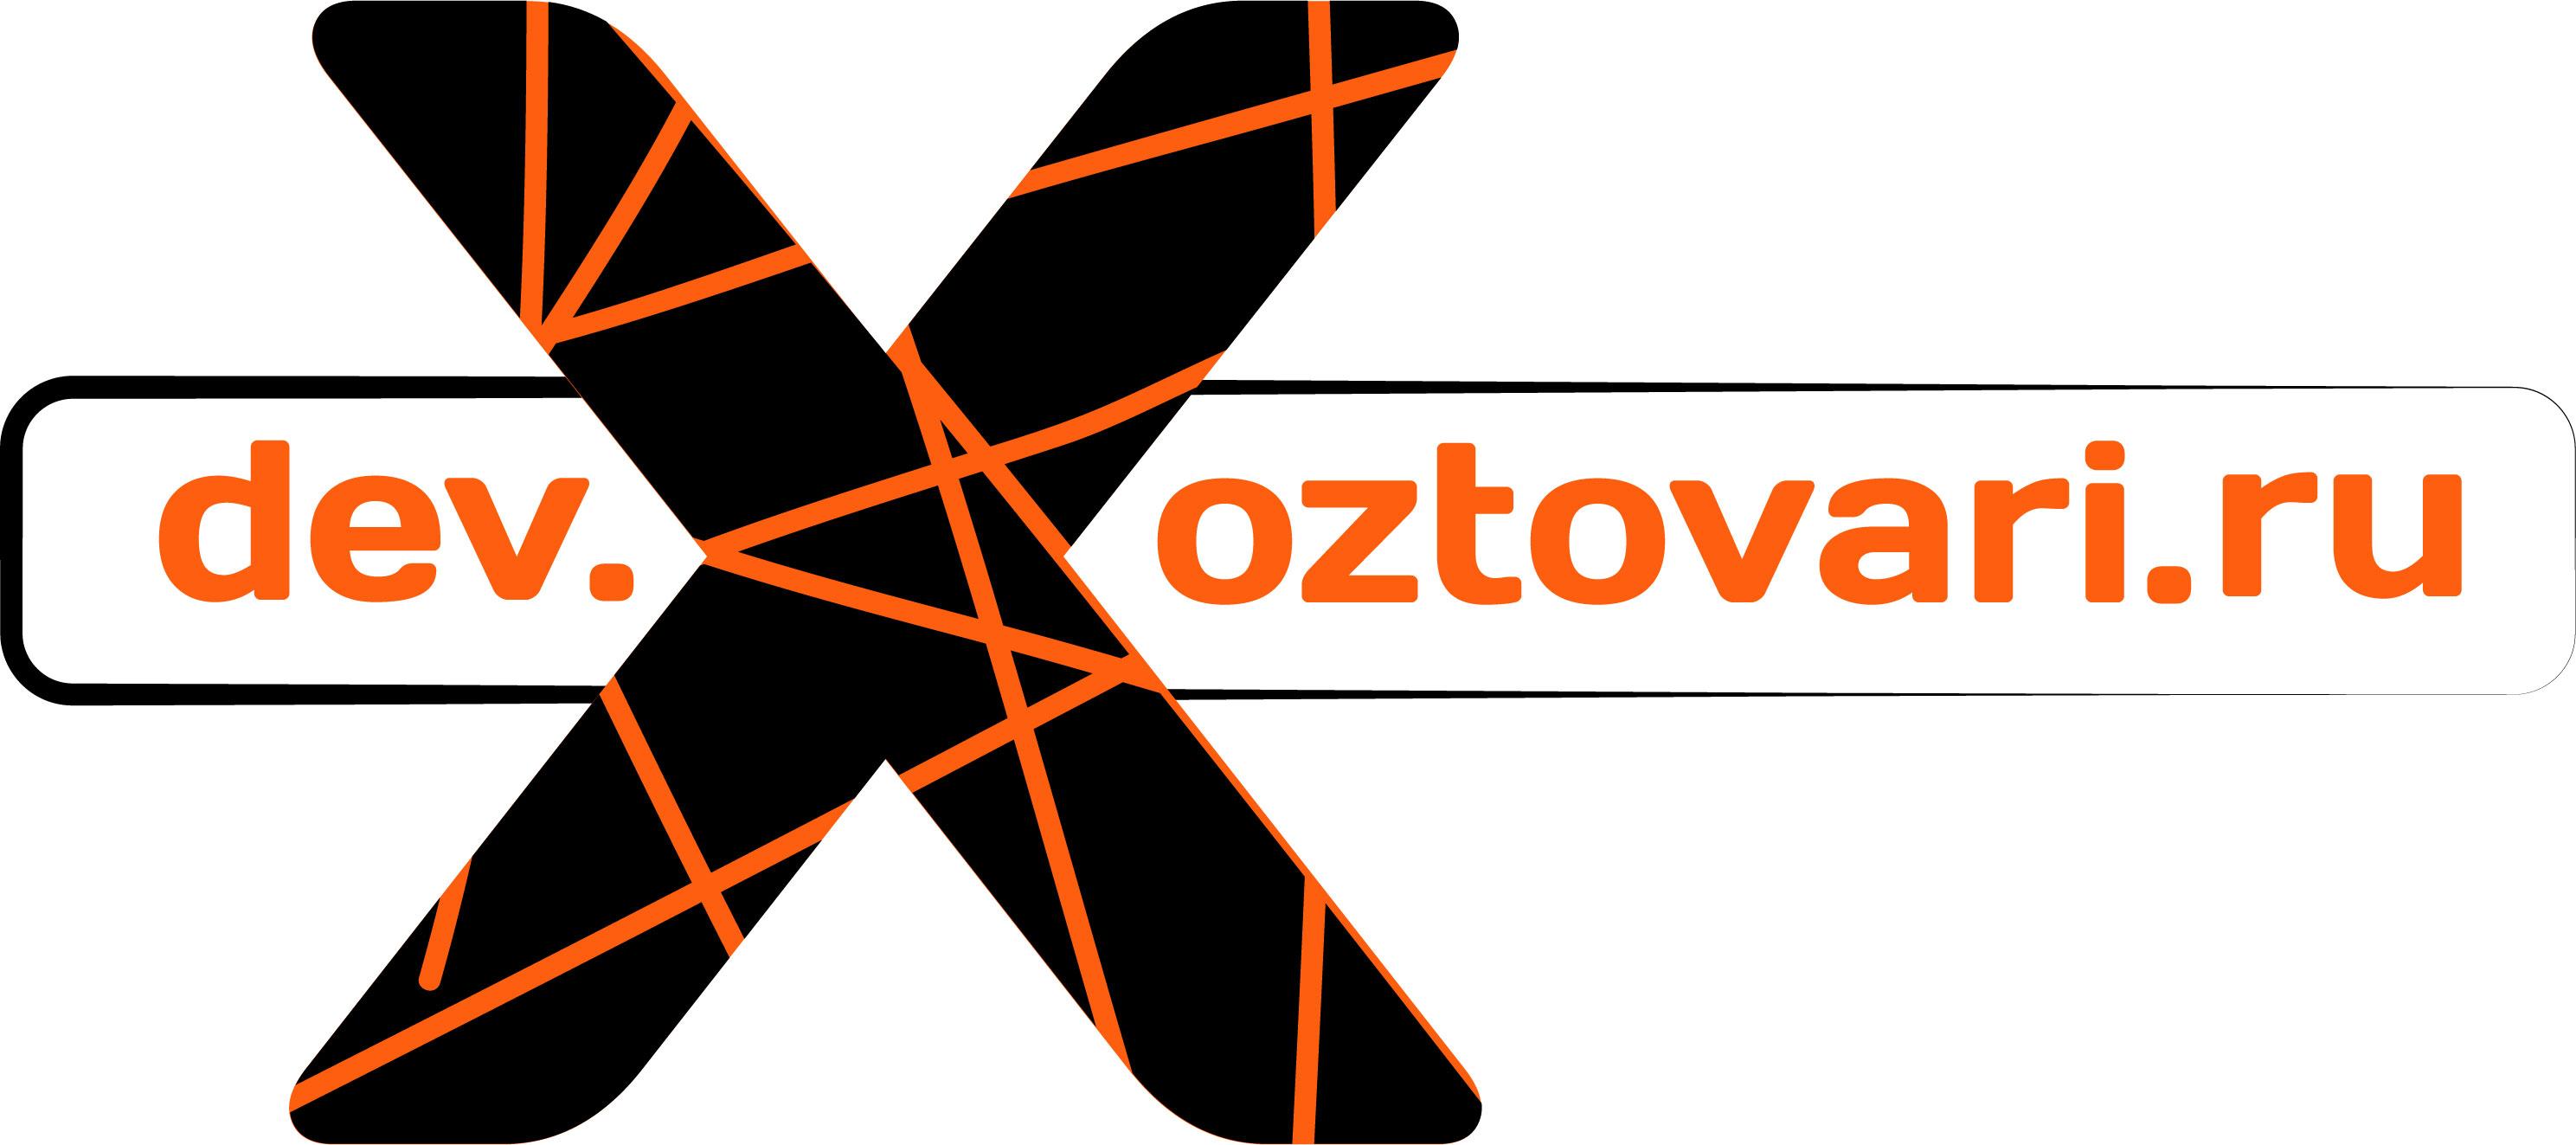 Разработка логотипа для оптового интернет-магазина «Хозтовары.ру» фото f_017606c912d355ae.jpg